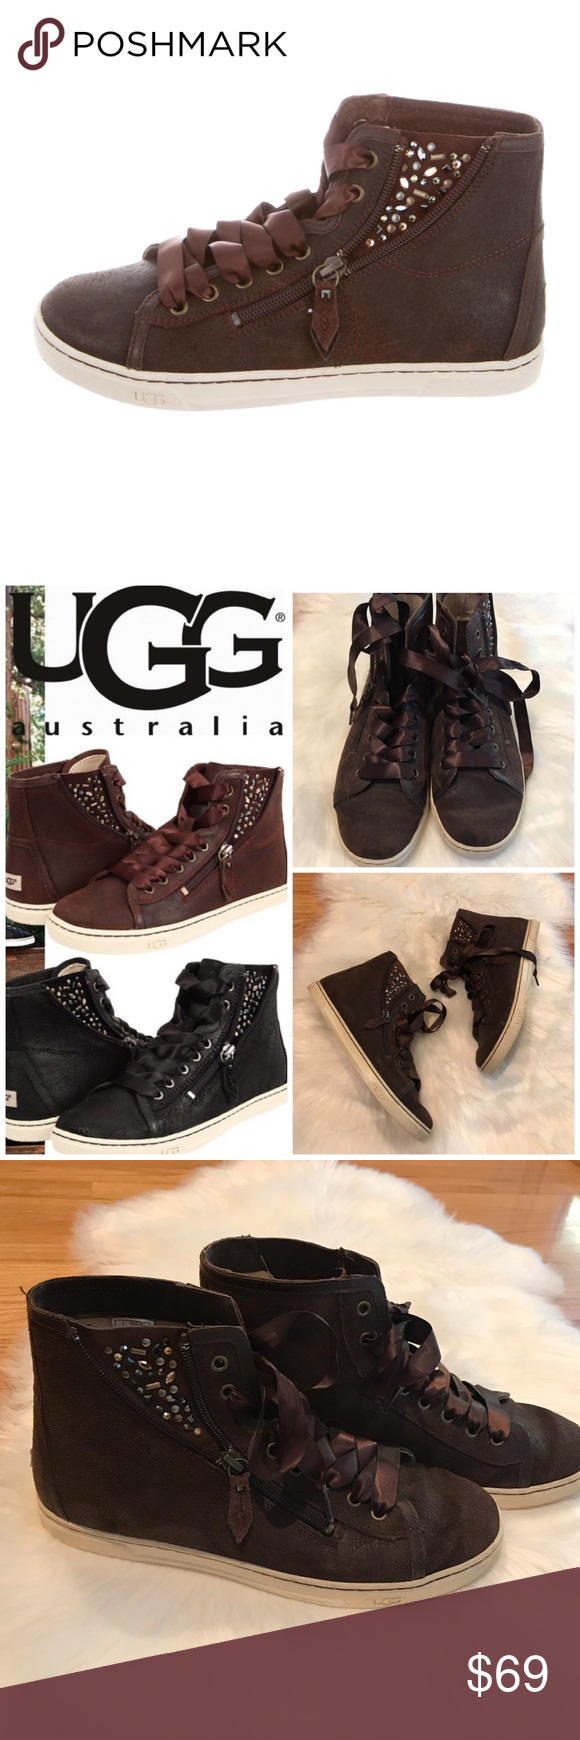 10aad8e4121 UGG 9.5 Blaney brown rhinestone high top sneakers Very good ...